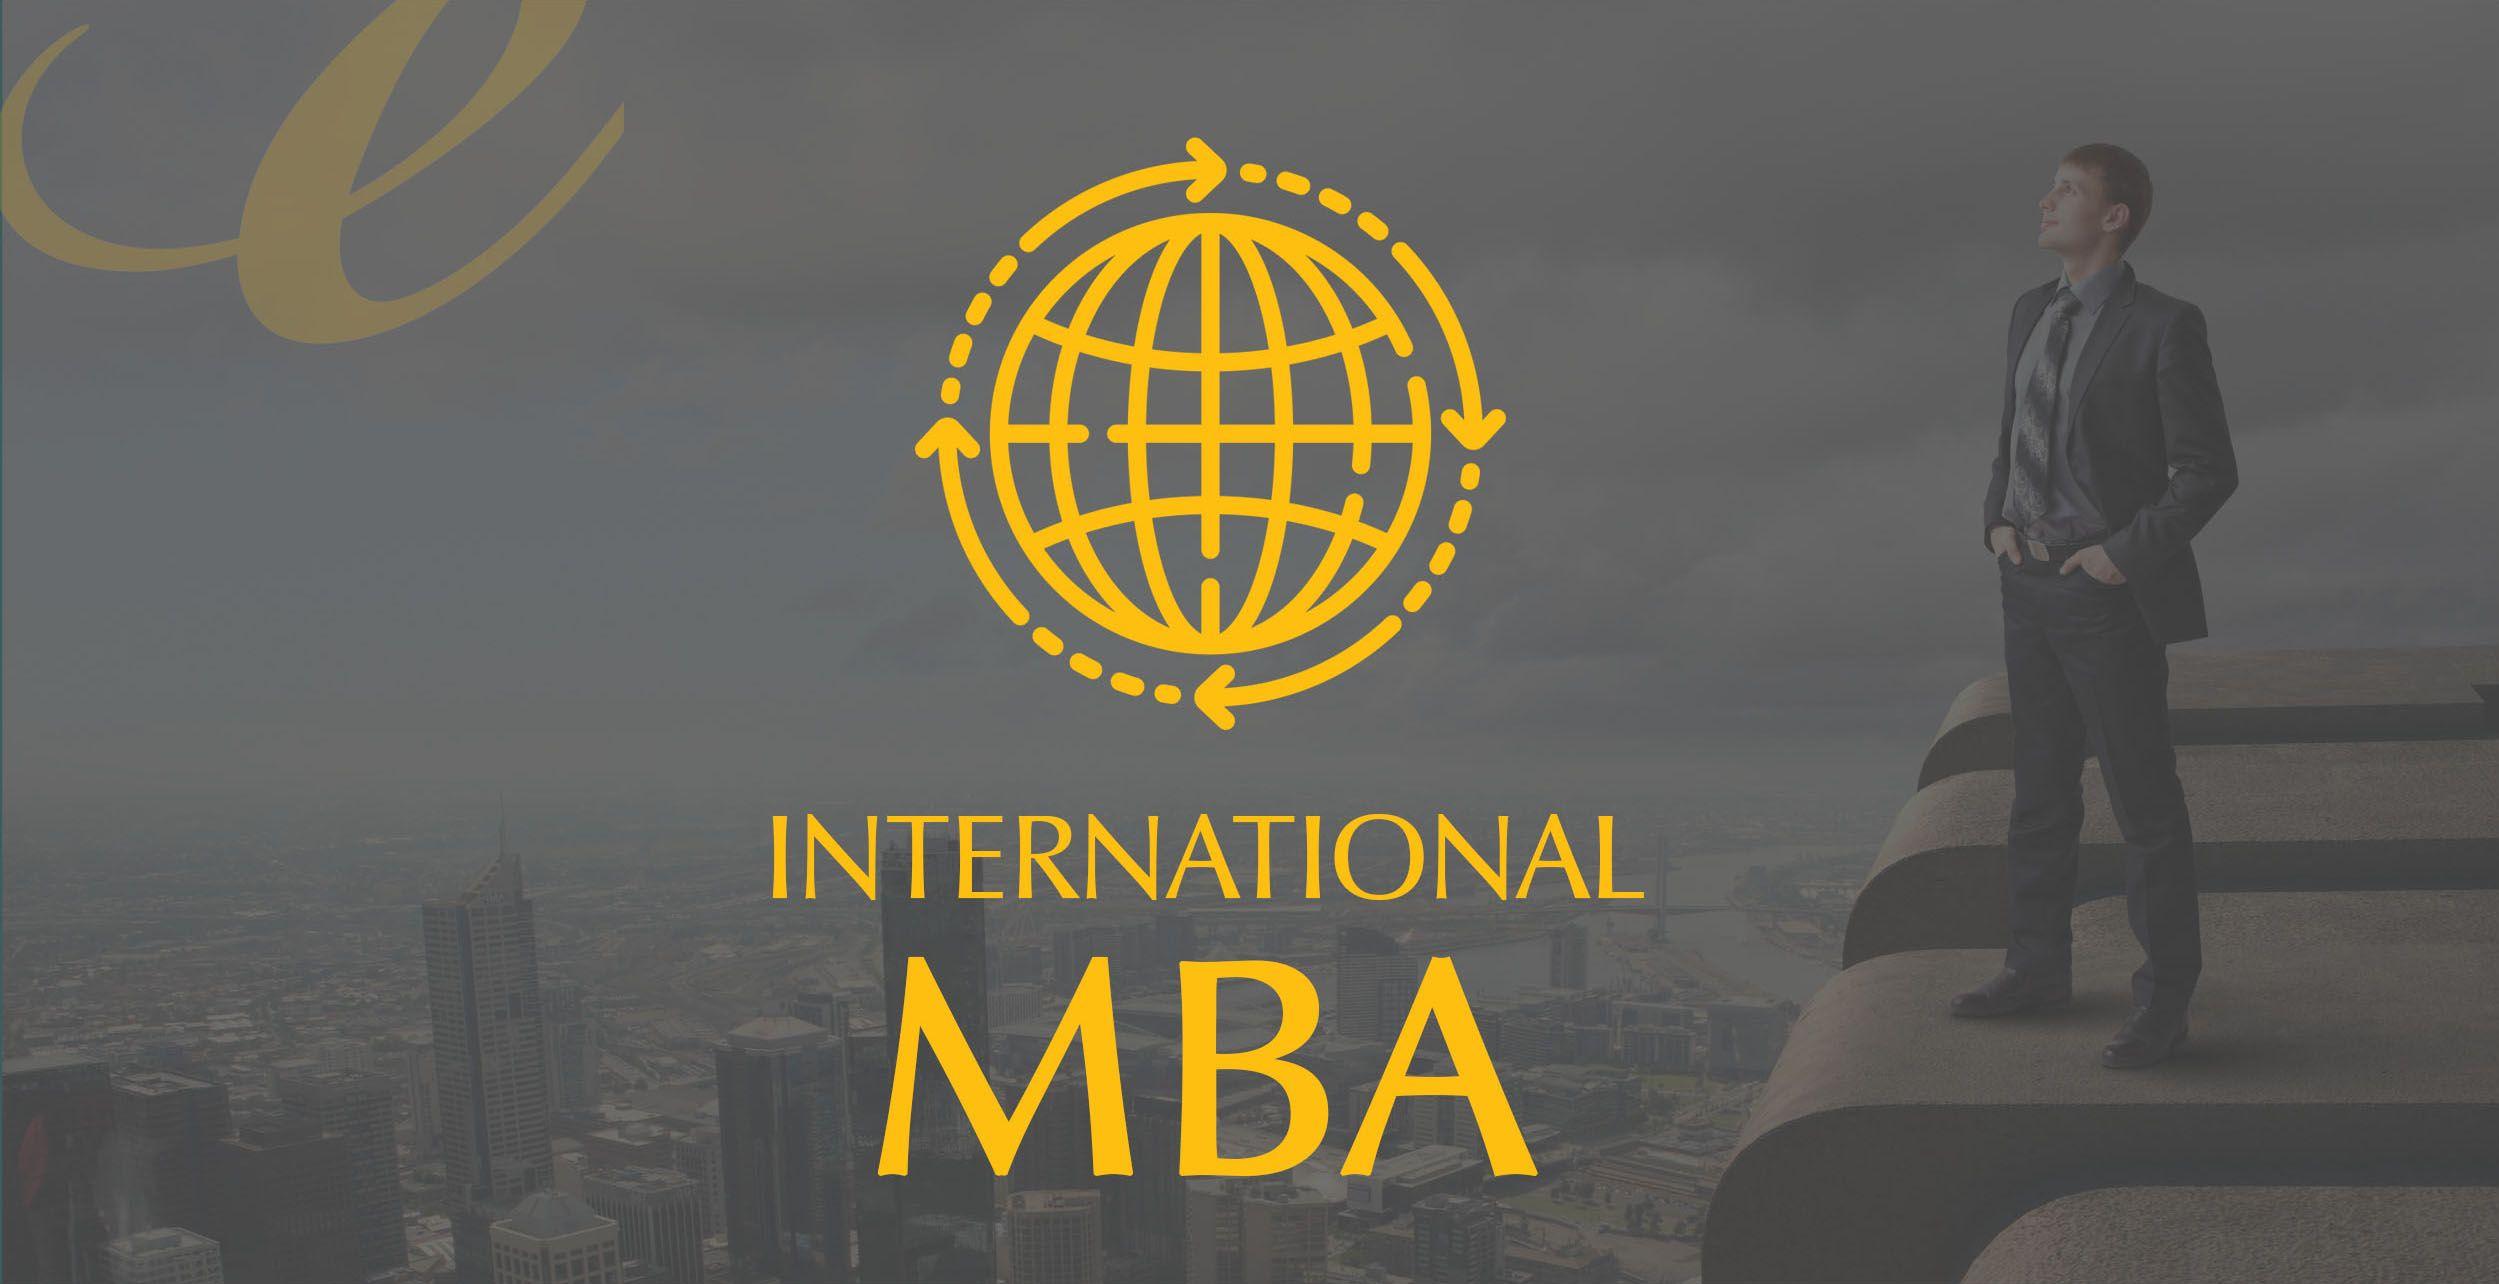 International MBA South Africa Mba